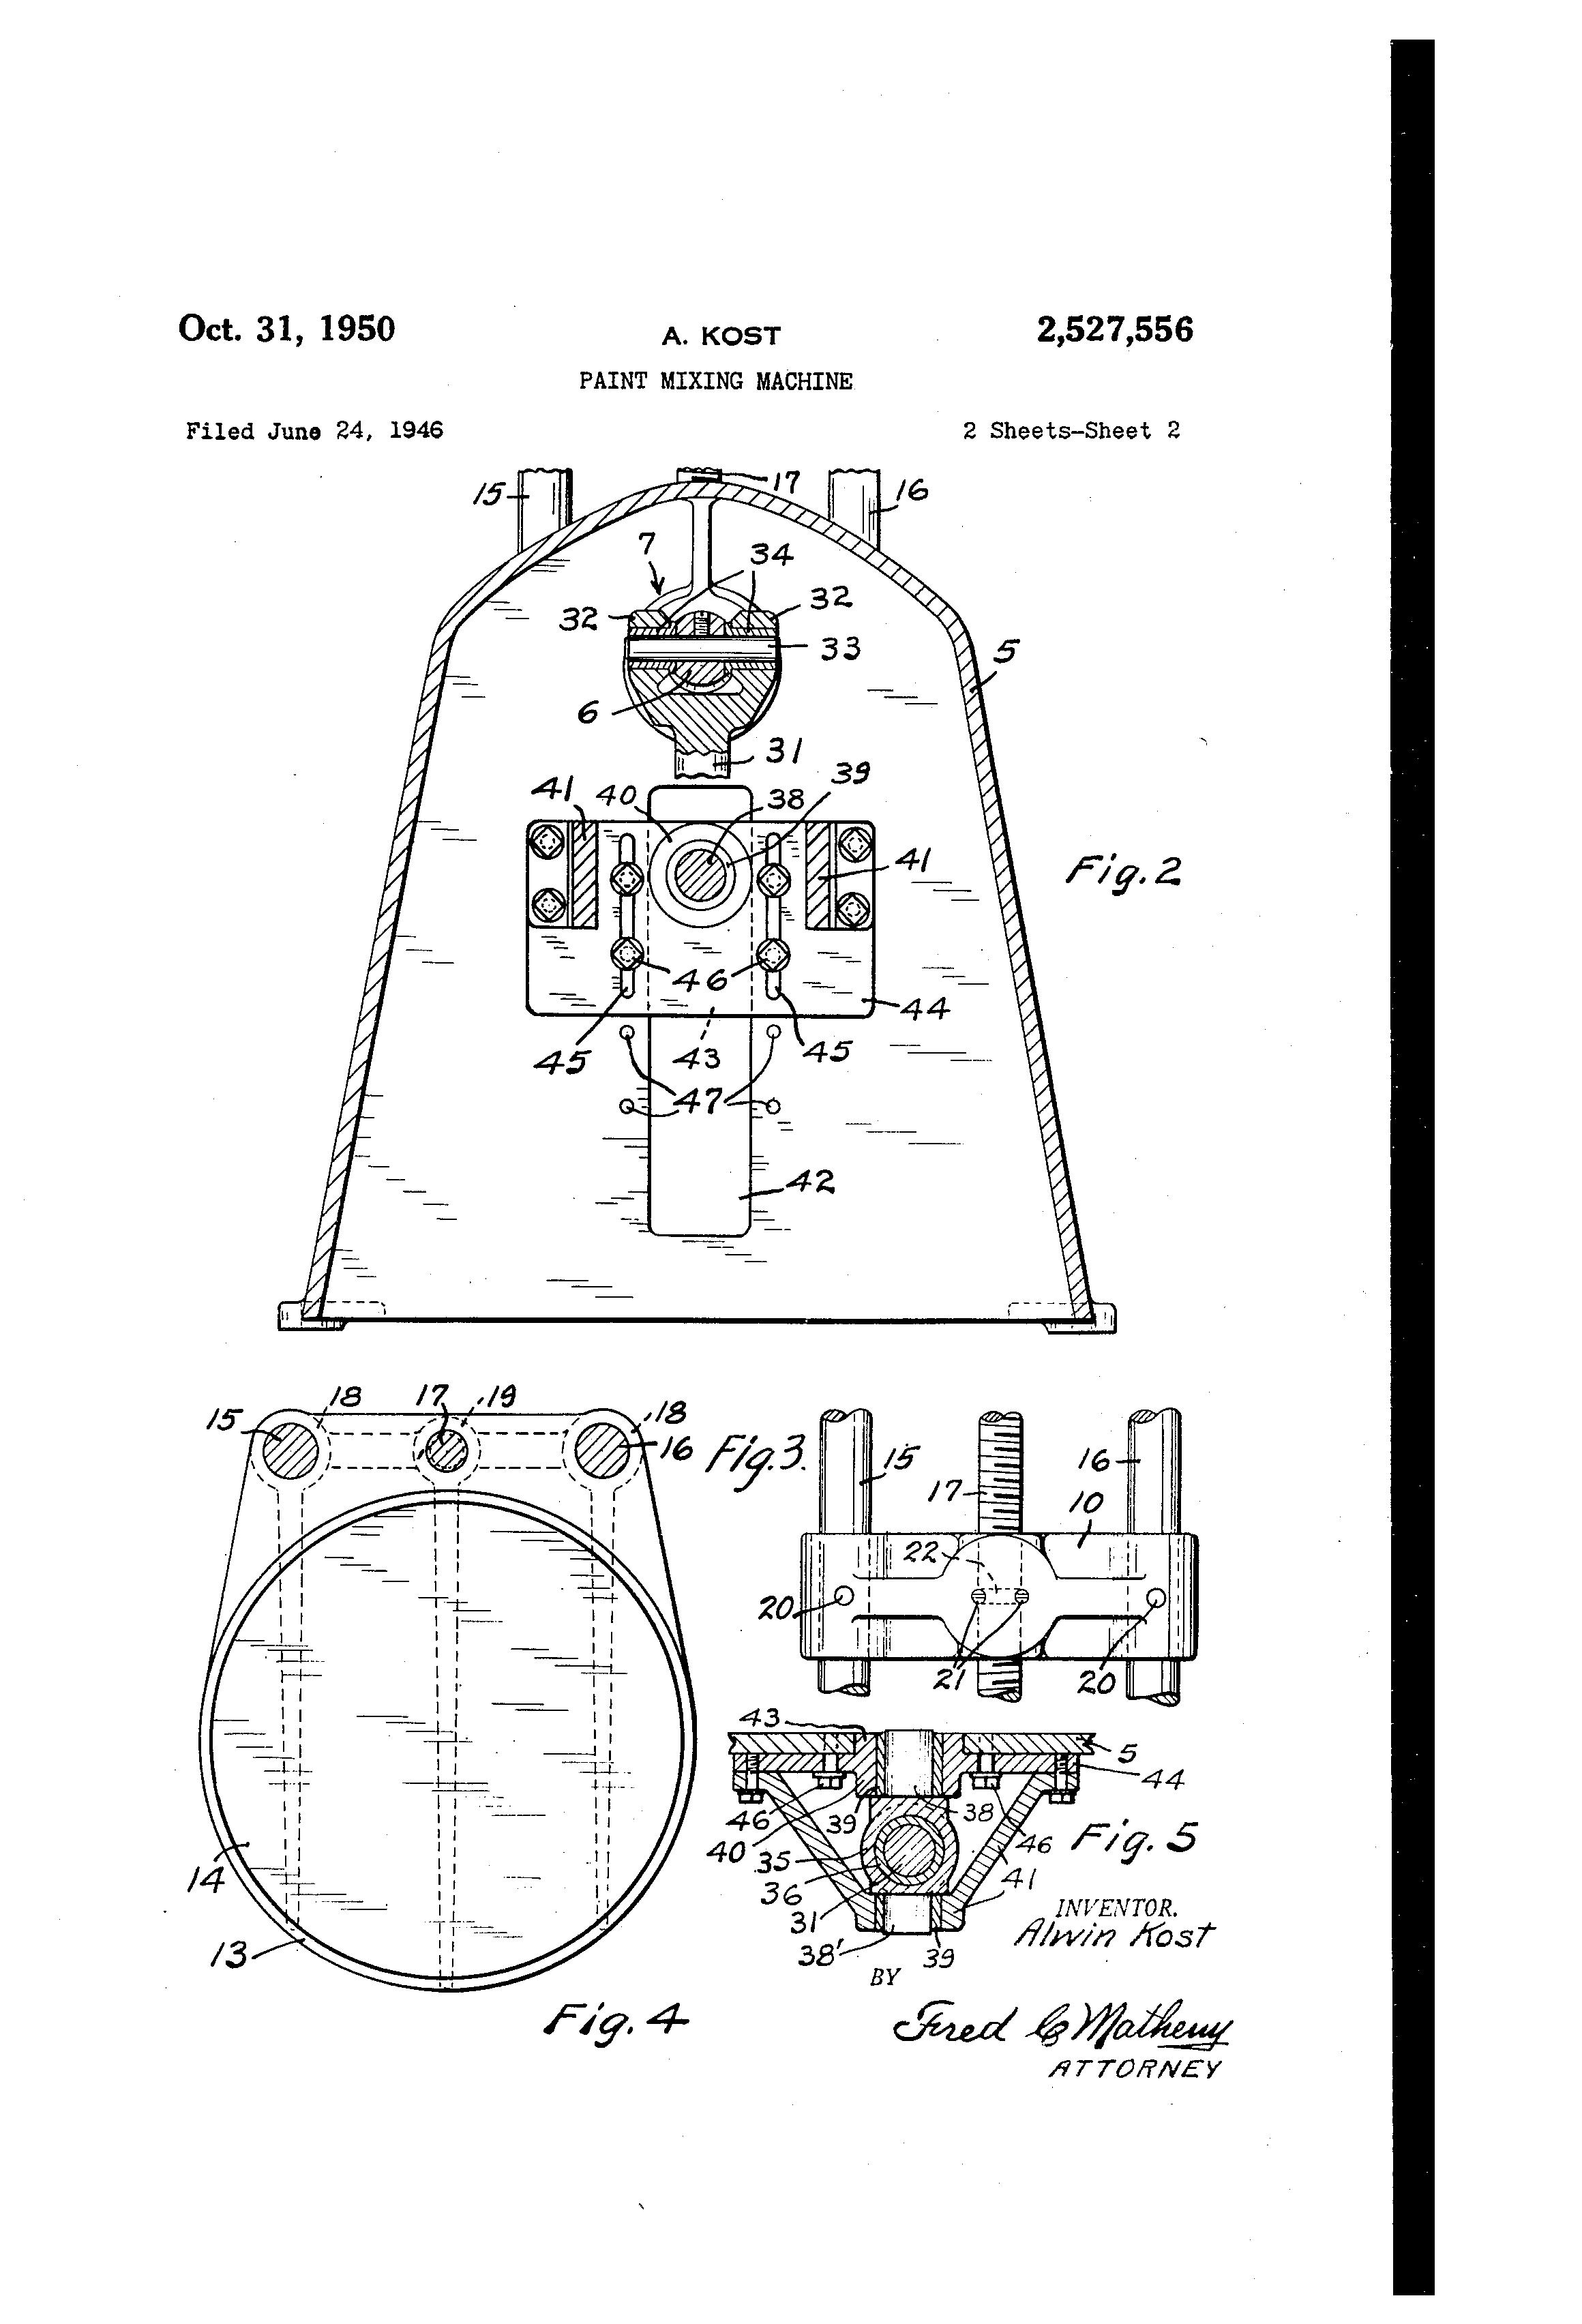 Brevet Us2527556 Paint Mixing Machine Google Brevets 2004 Lotus Esprit Wiring Diagram Patent Drawing